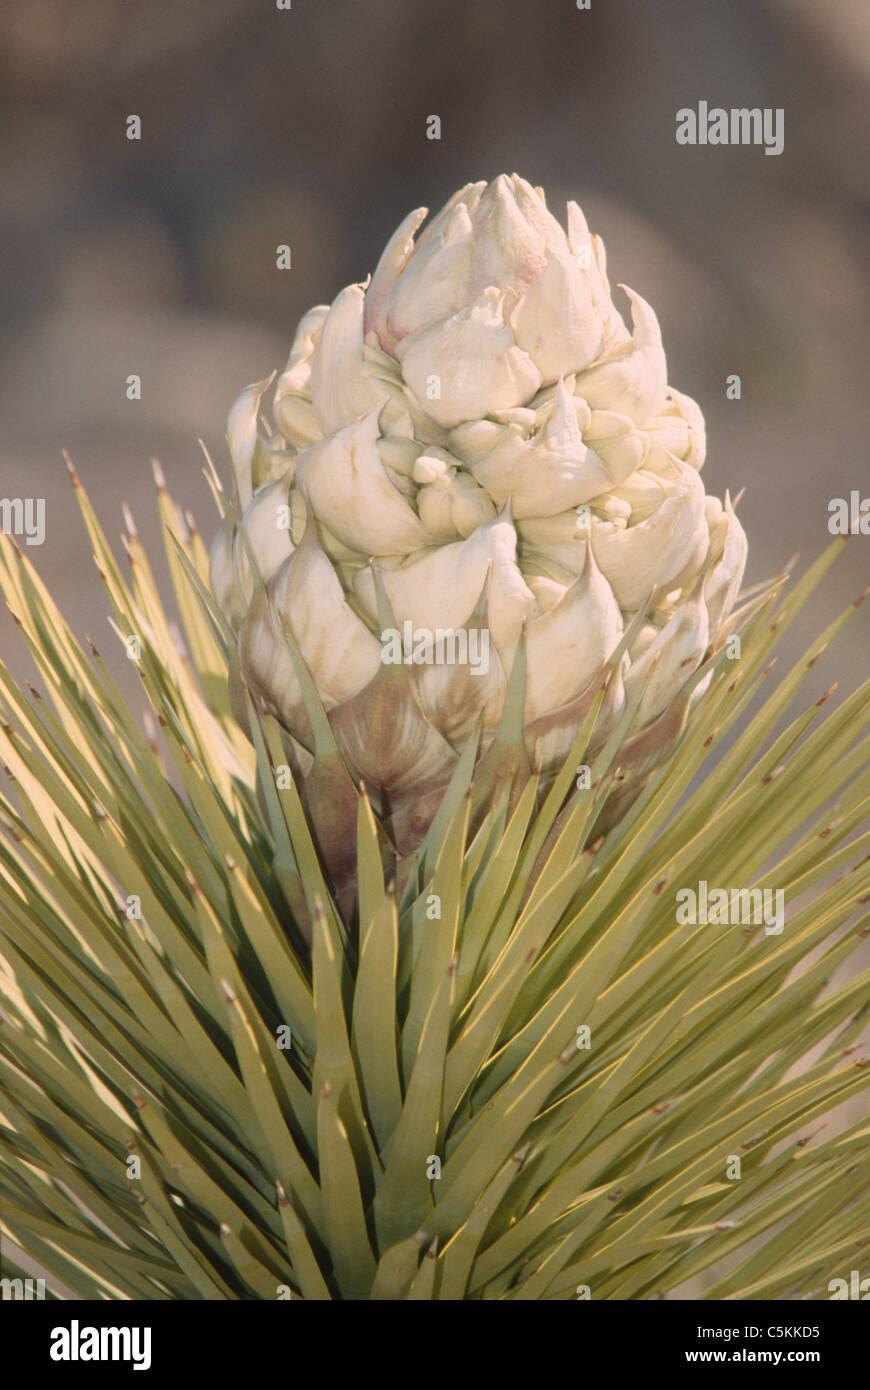 naturaleza, planta, cactus, desierto, repollando, espinas, pullas, biologia, textura, california, ca, usa, Michael - Stock Image